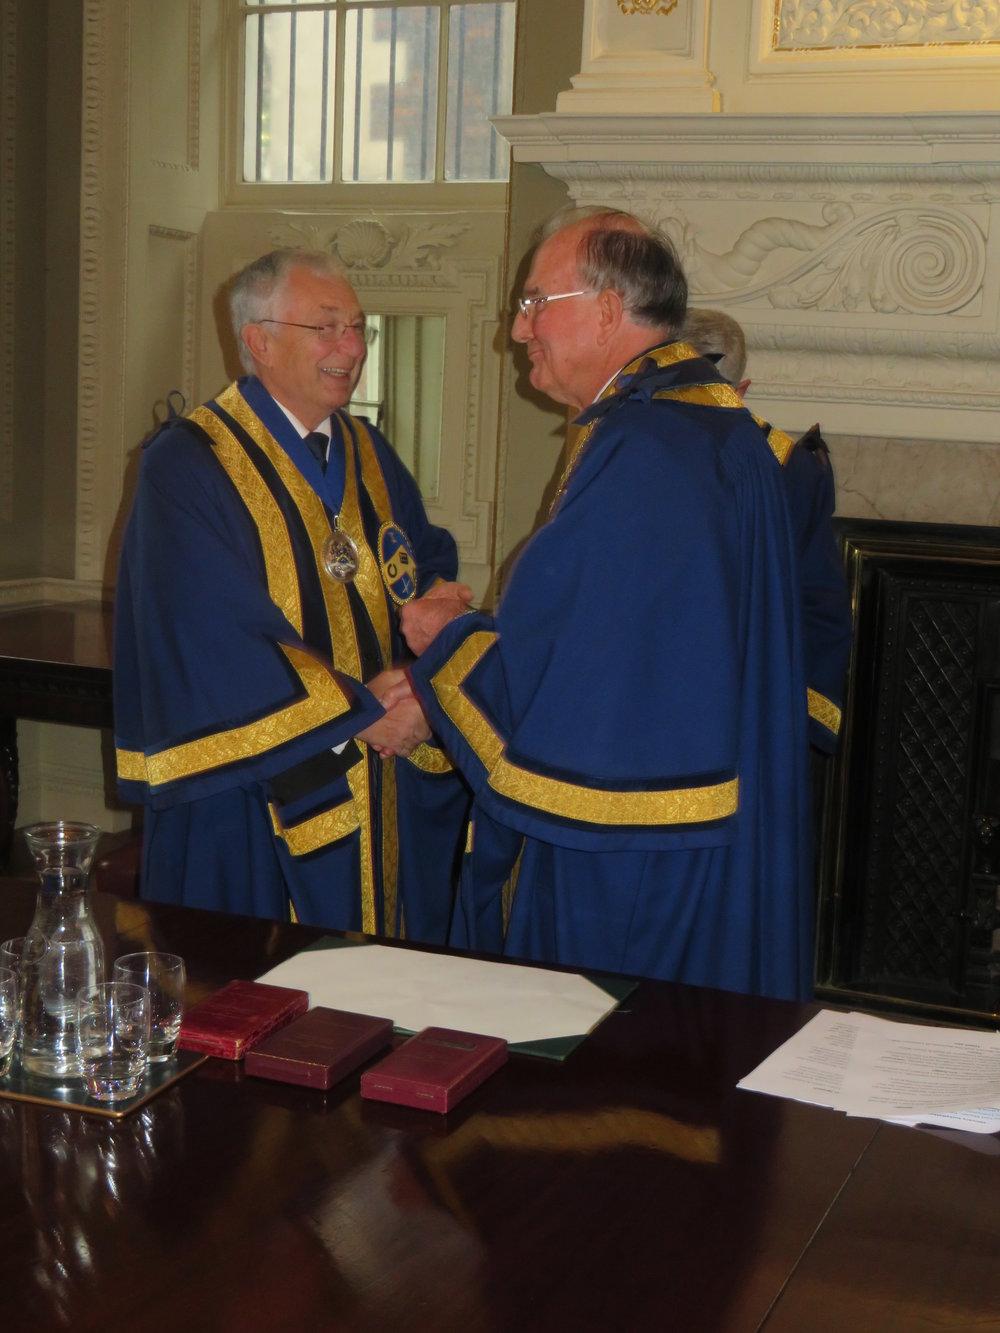 Honorary Chaplain Third Warden The Reverend G L Warren